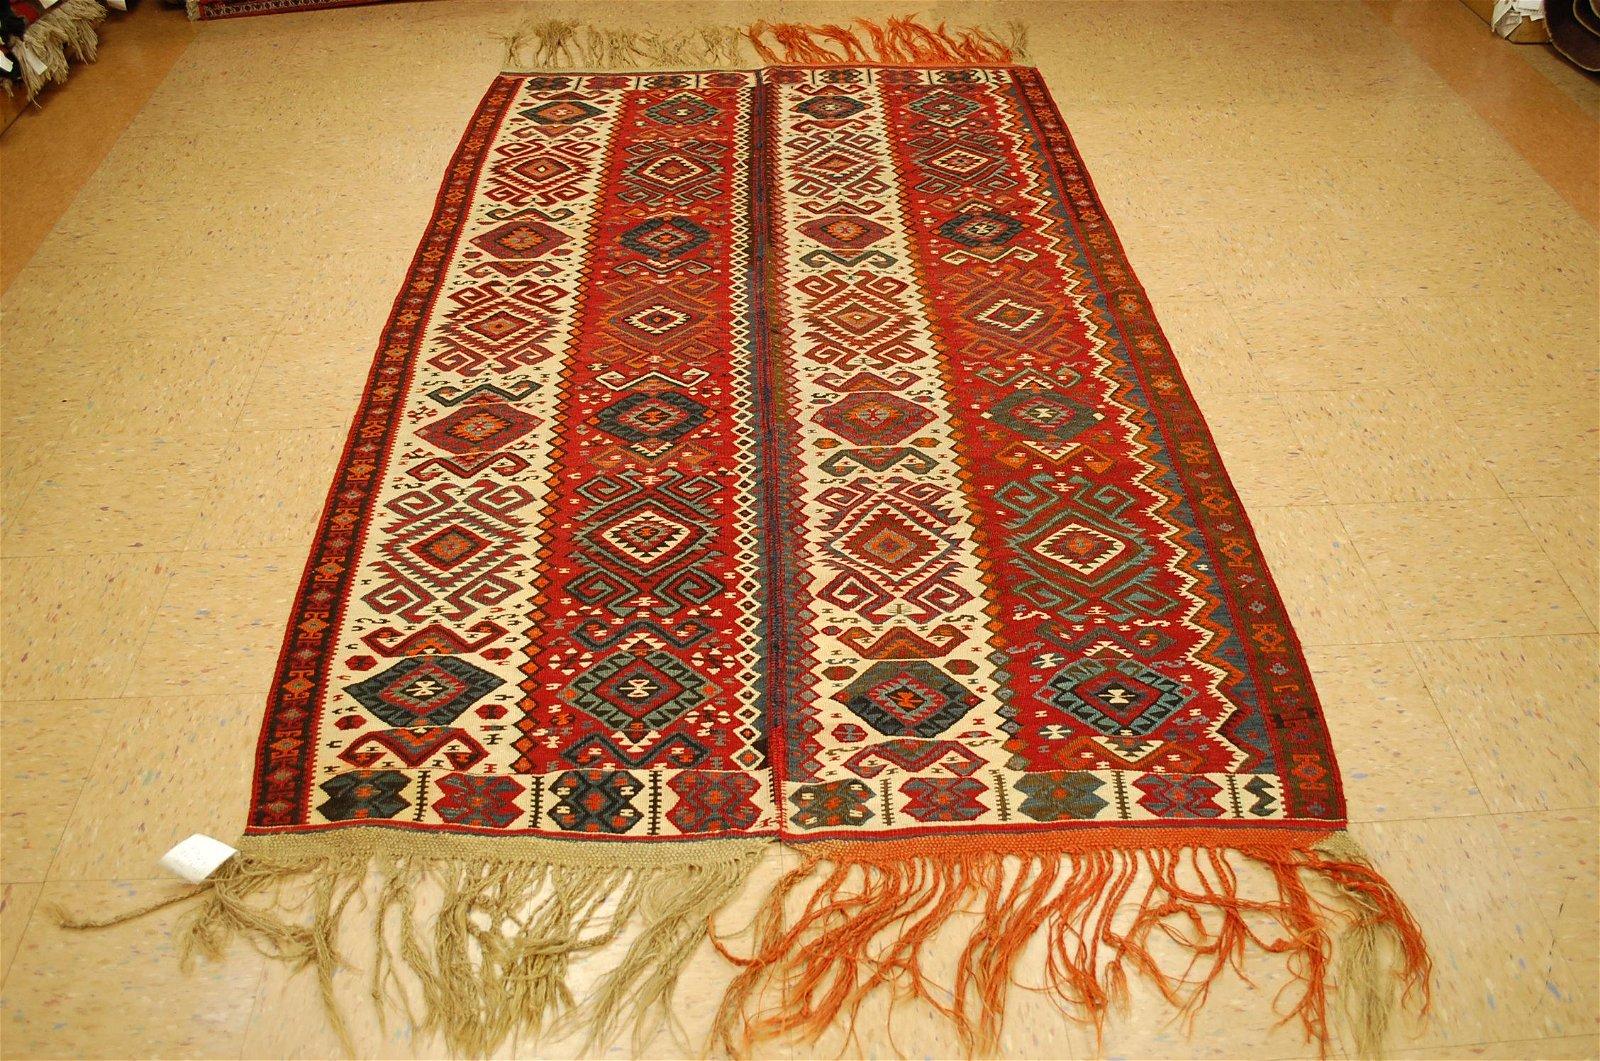 Cir 1920's Antique Detailed Caucasian Kilim Flat Woven